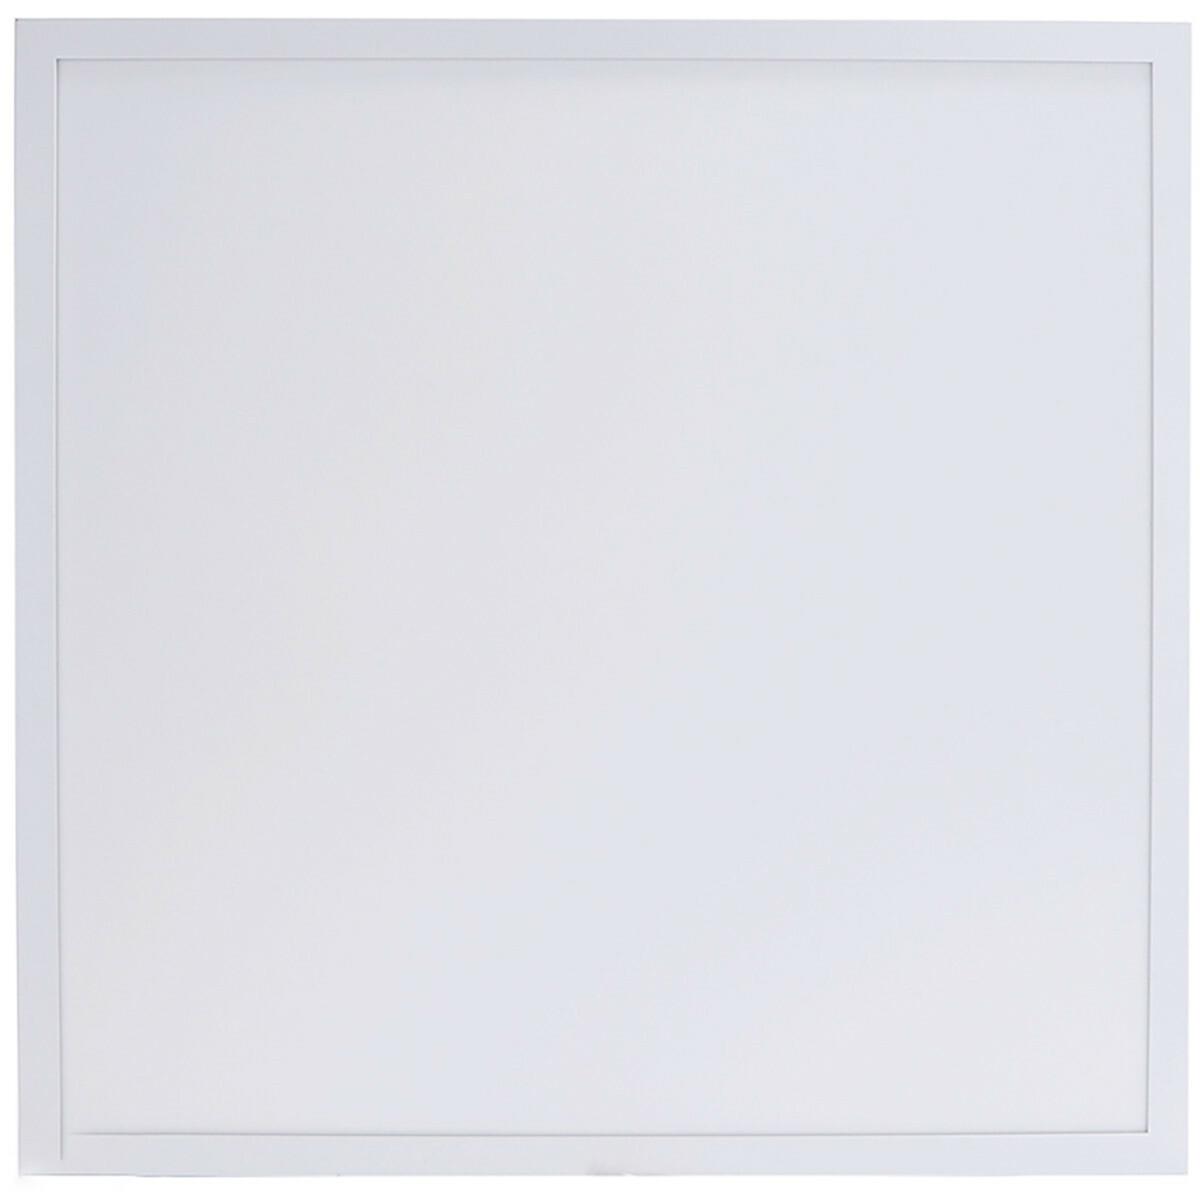 LED Paneel - Aigi Hyron - 60x60 - Aanpasbare Kleur CCT - 40W - Inbouw - Vierkant - Mat Wit - Aluminium - Flikkervrij